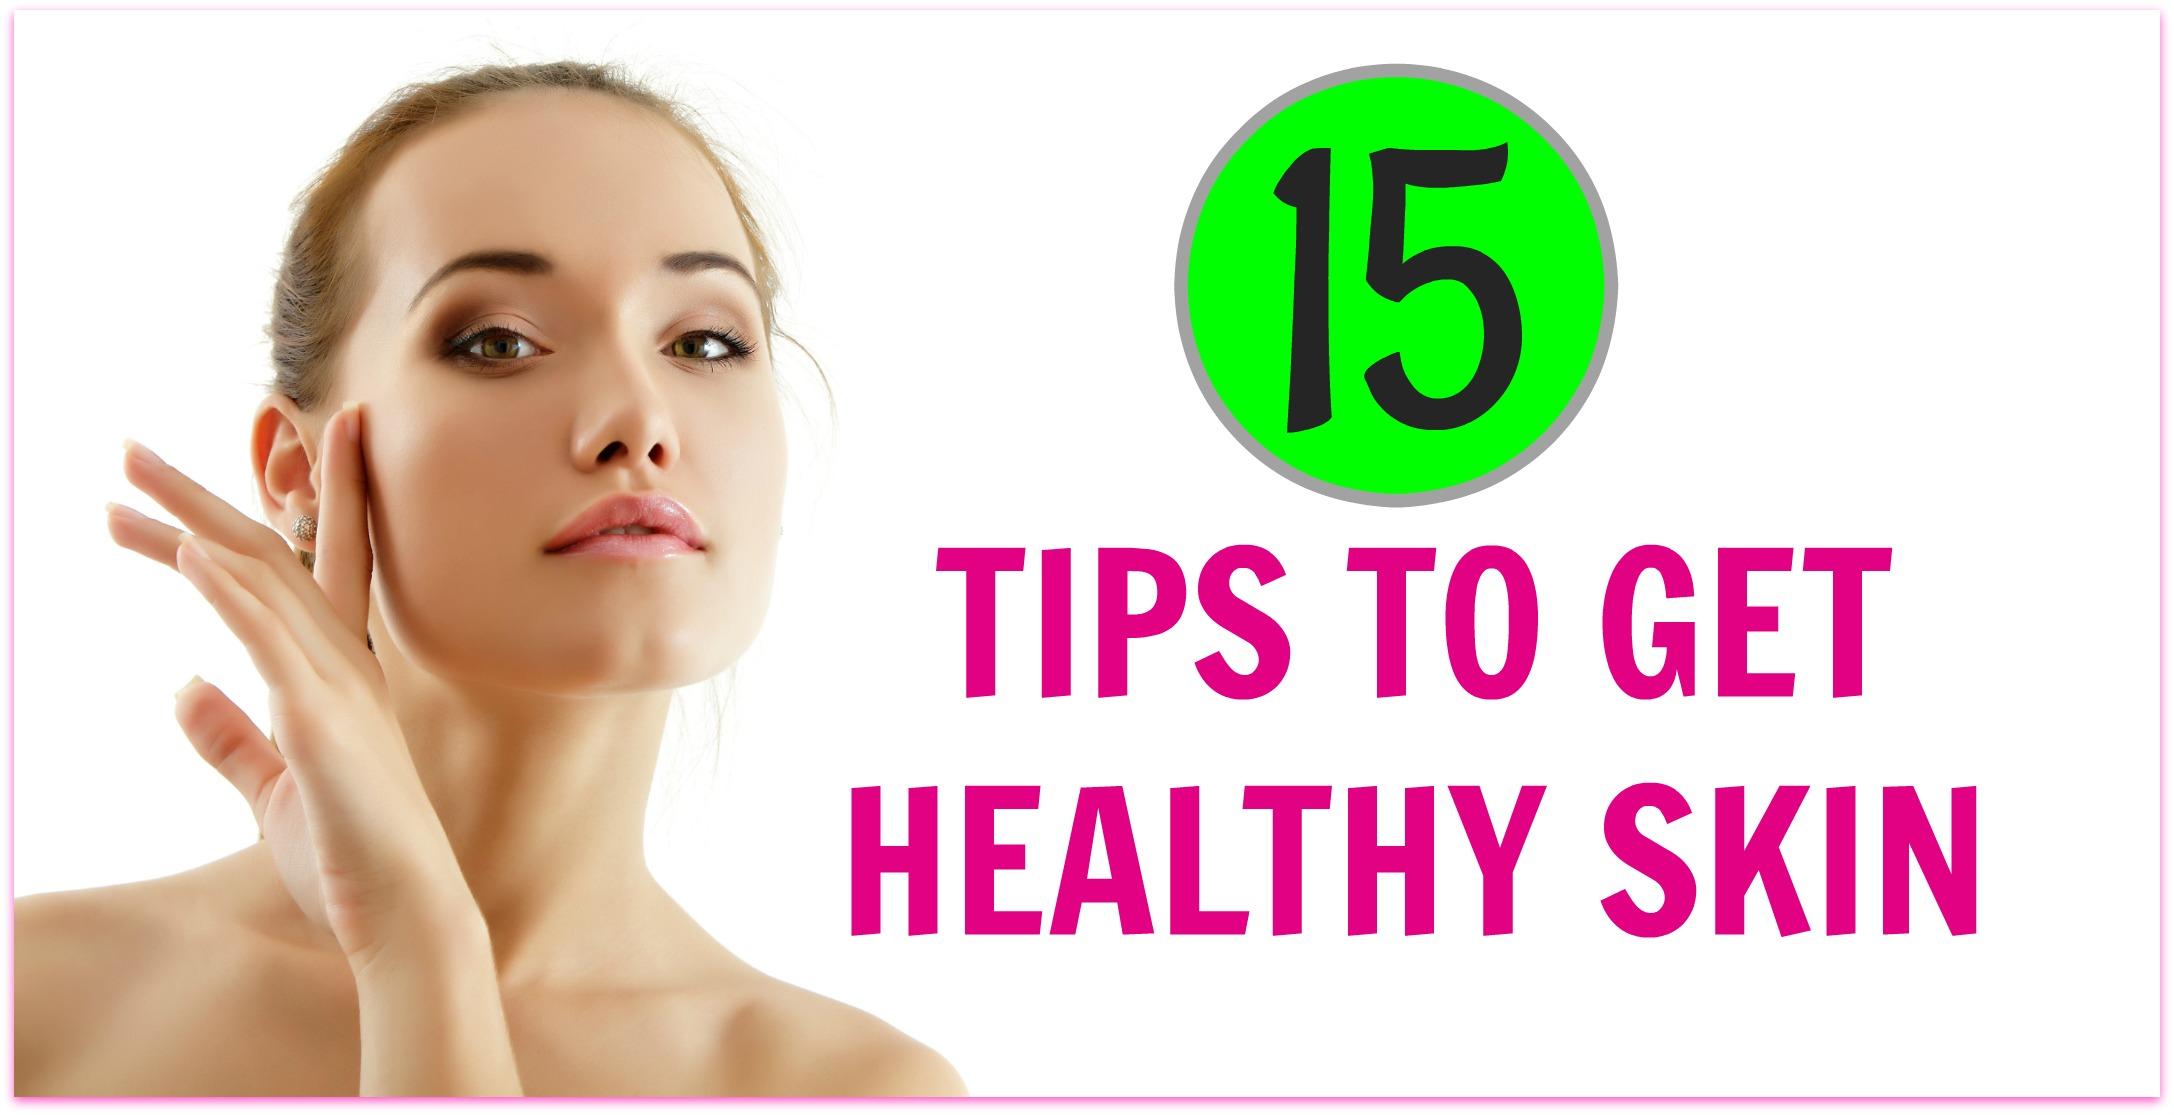 Watch How to Get Healthier Skin video